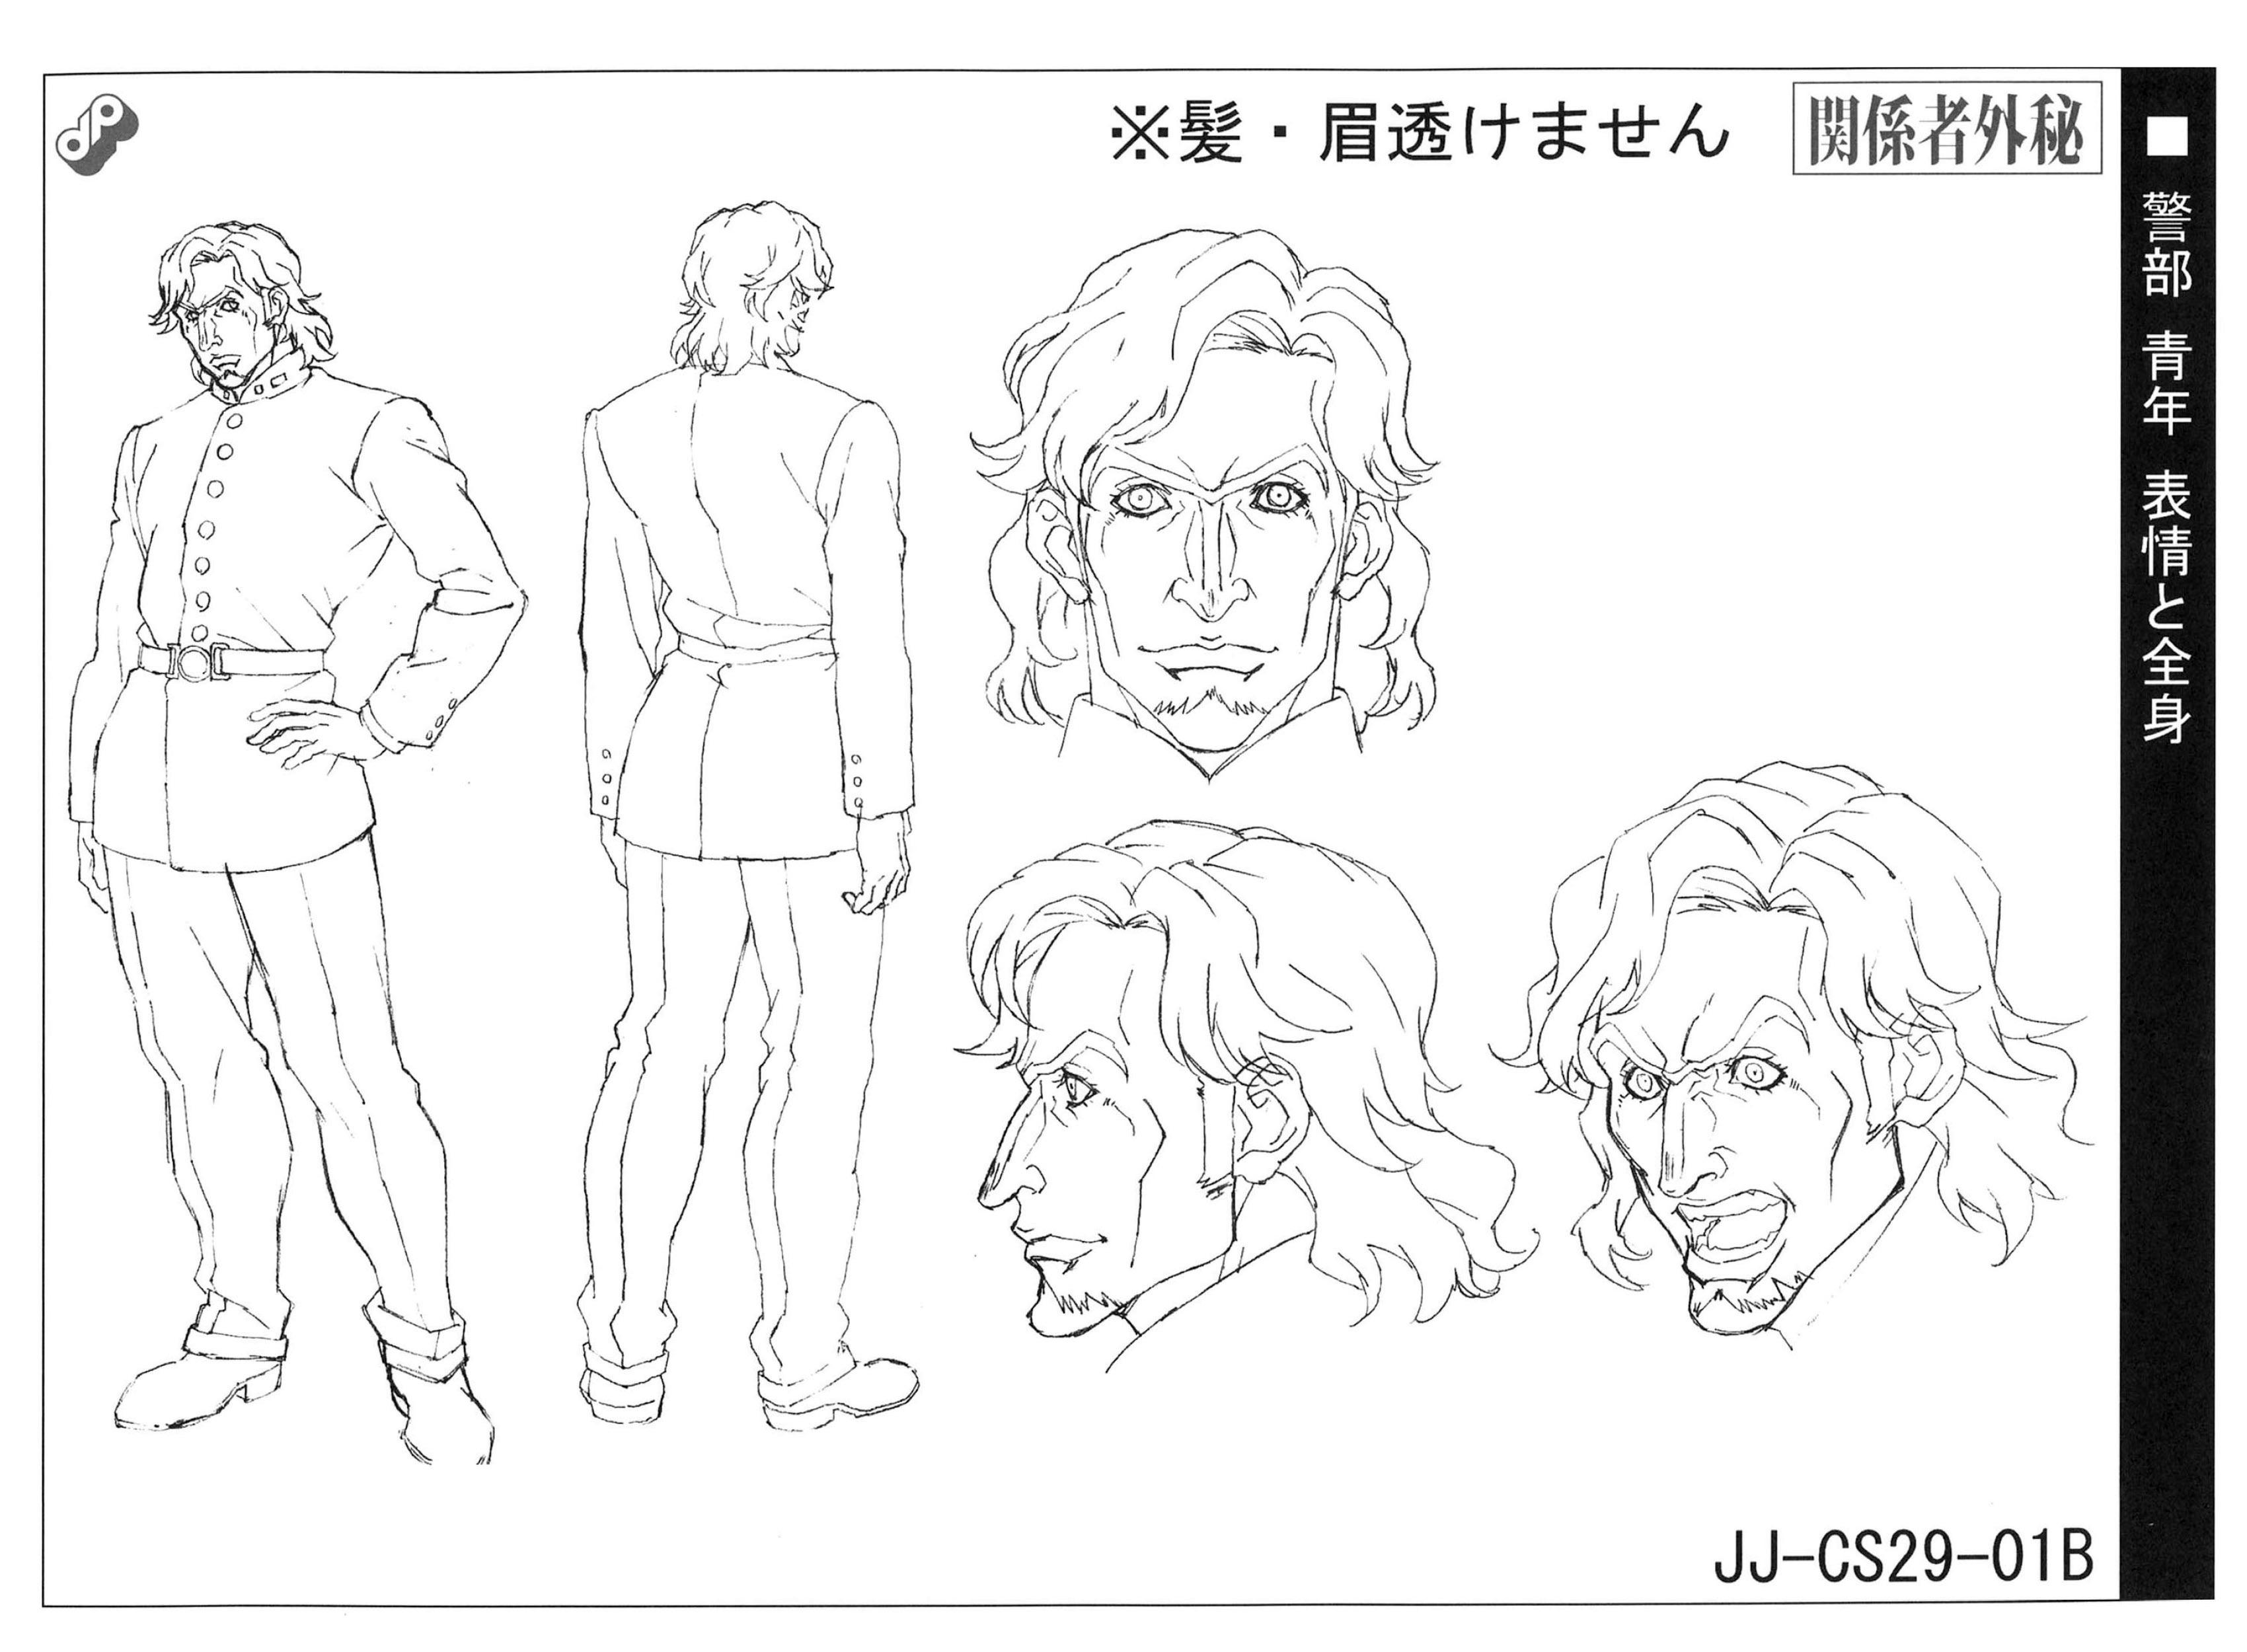 Inspector anime ref 2